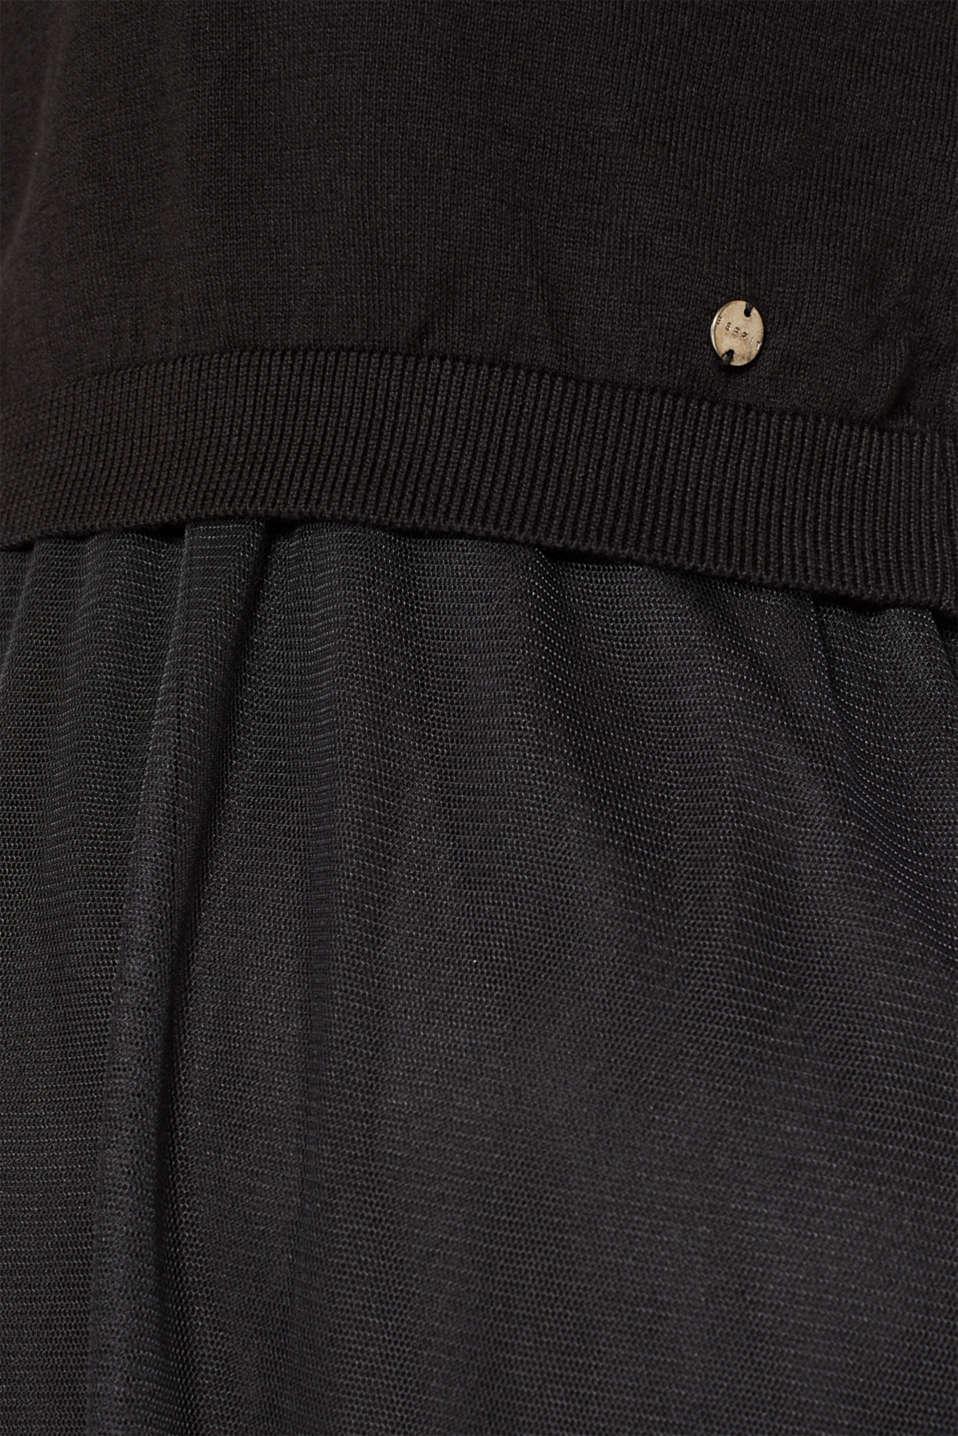 Dresses knitted, LCBLACK, detail image number 4